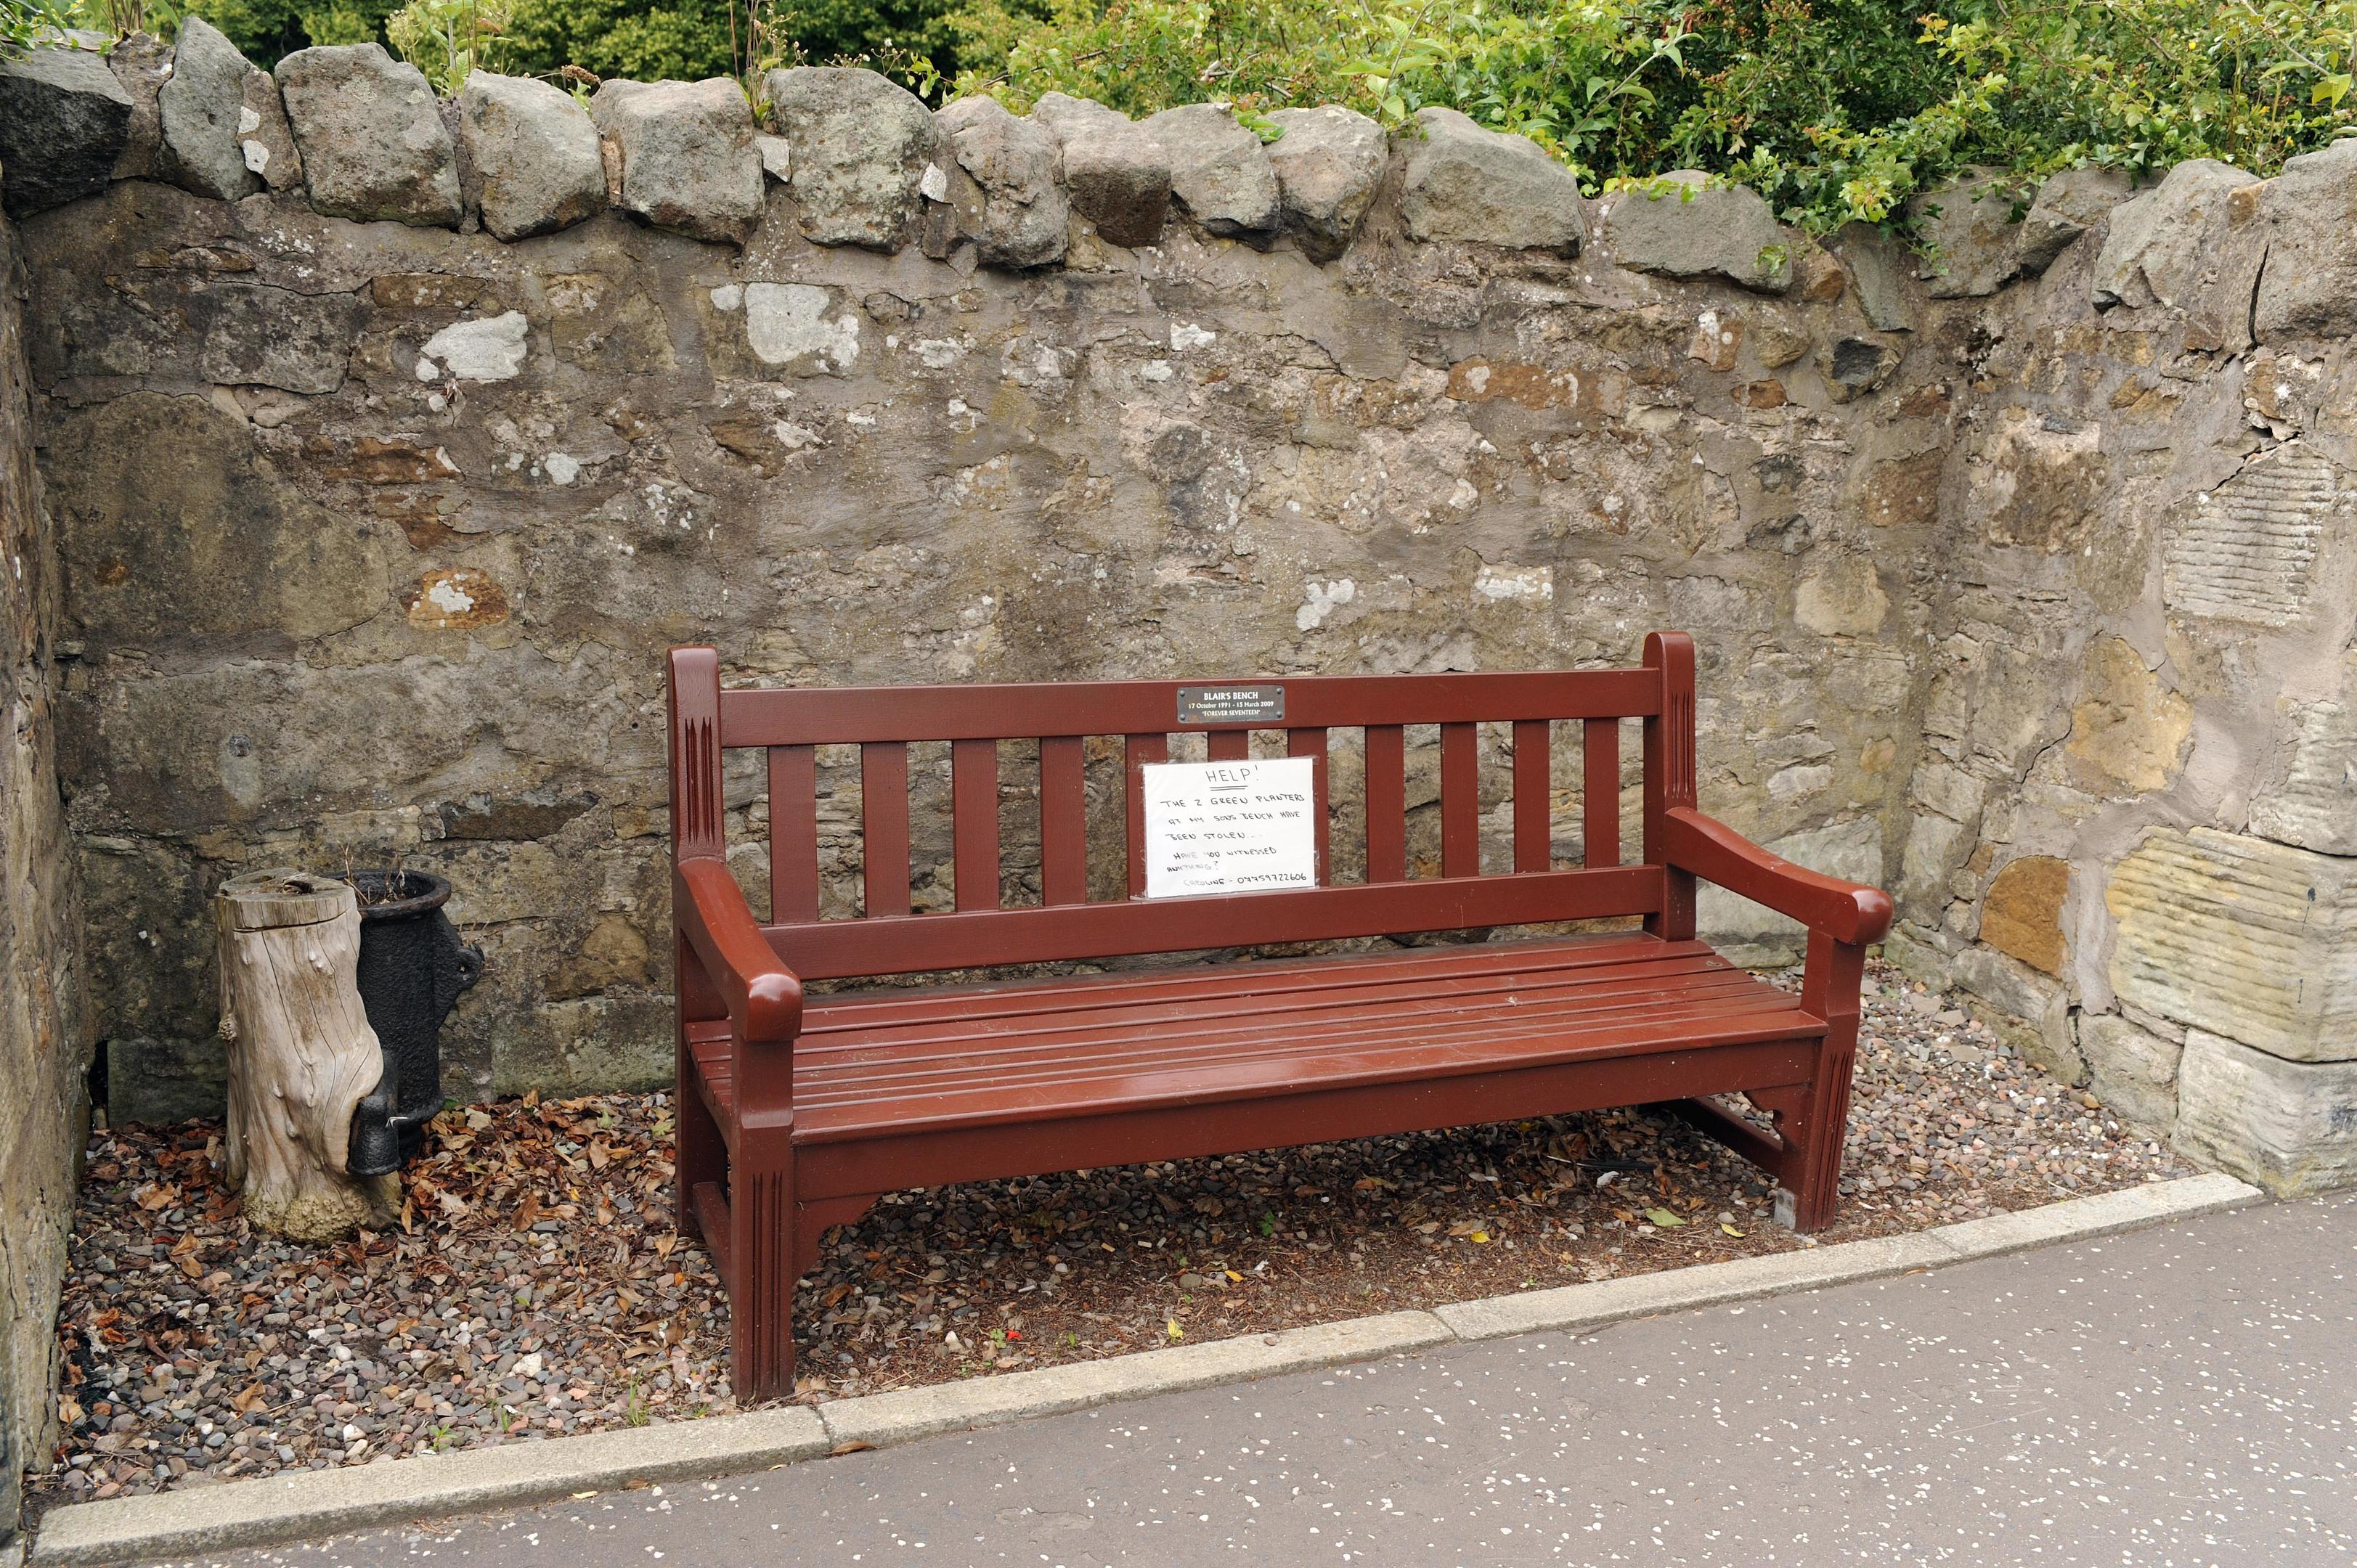 Blair's bench.